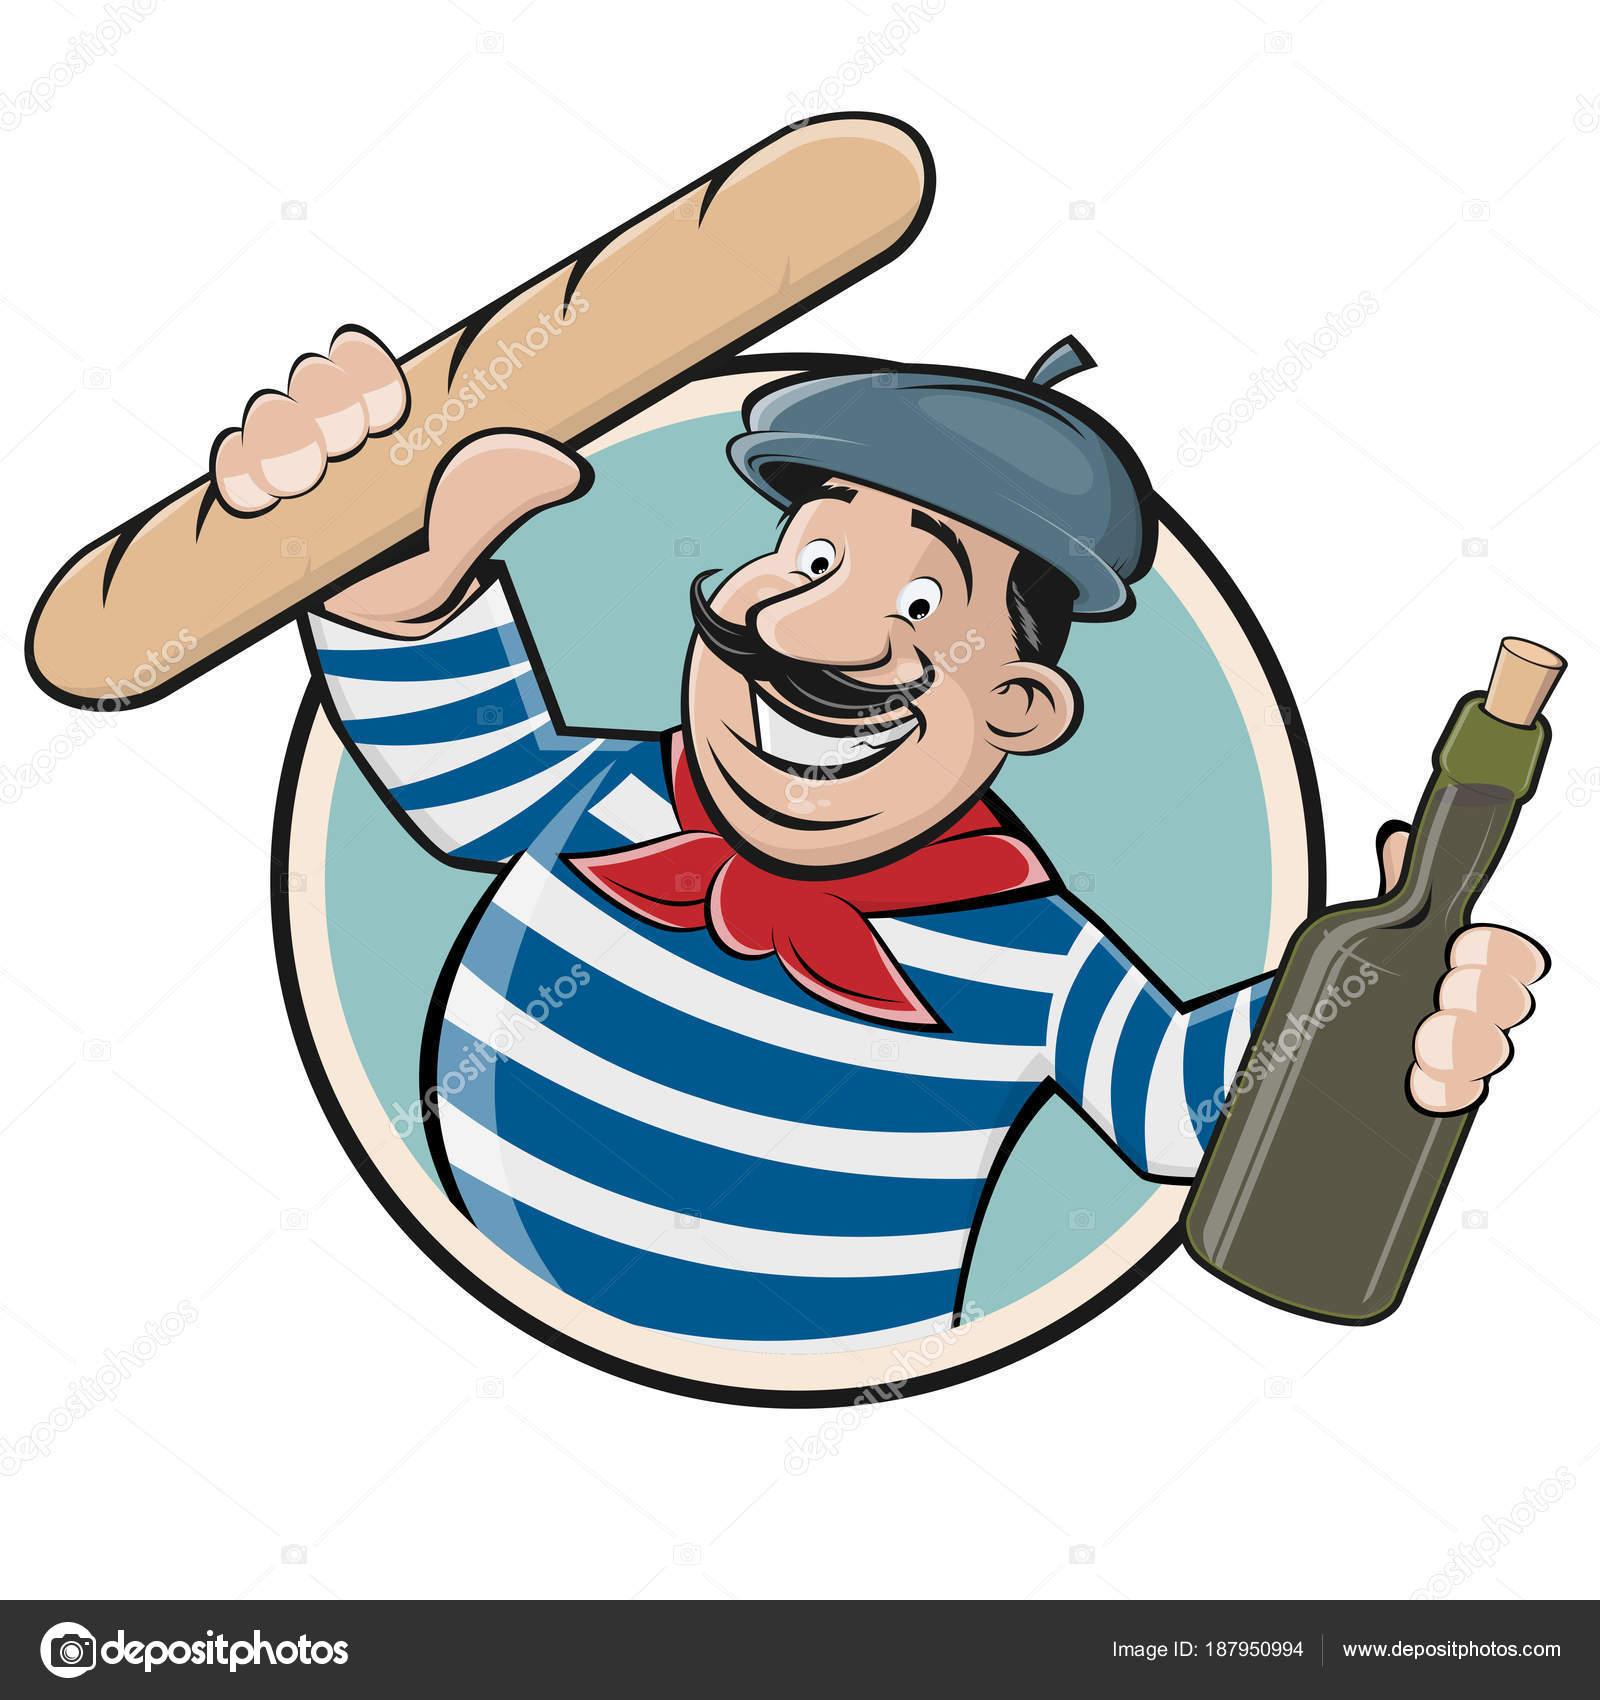 funny clipart french man baguette wine stock vector shockfactor rh depositphotos com Clip Art French Designs French Artist Clip Art